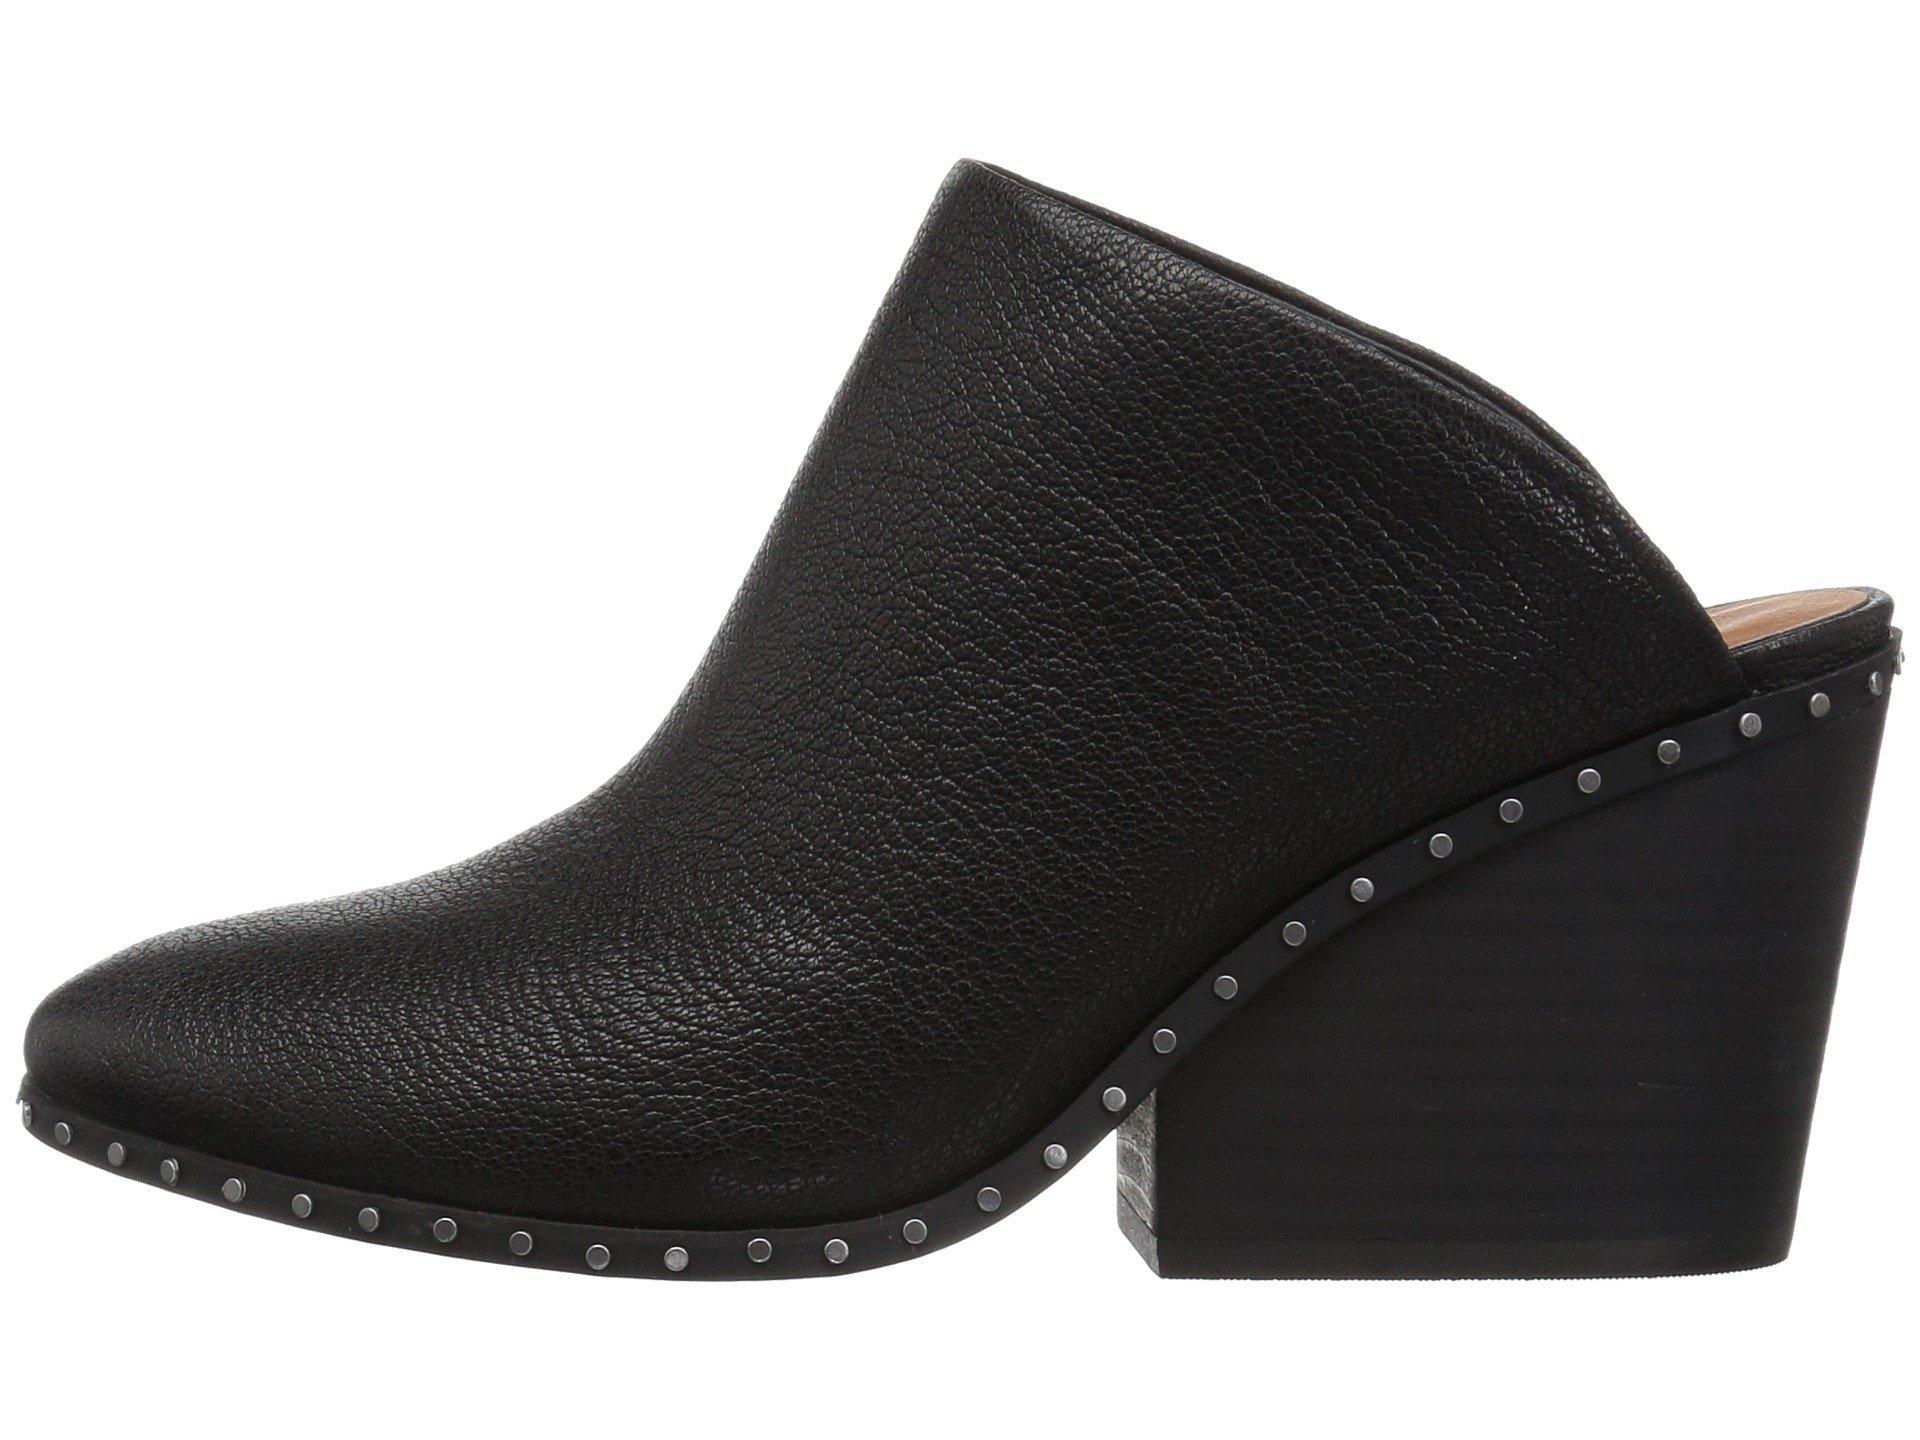 Lucky Brand Women's LARSSON2 Clog, Black, 7.5 Medium US